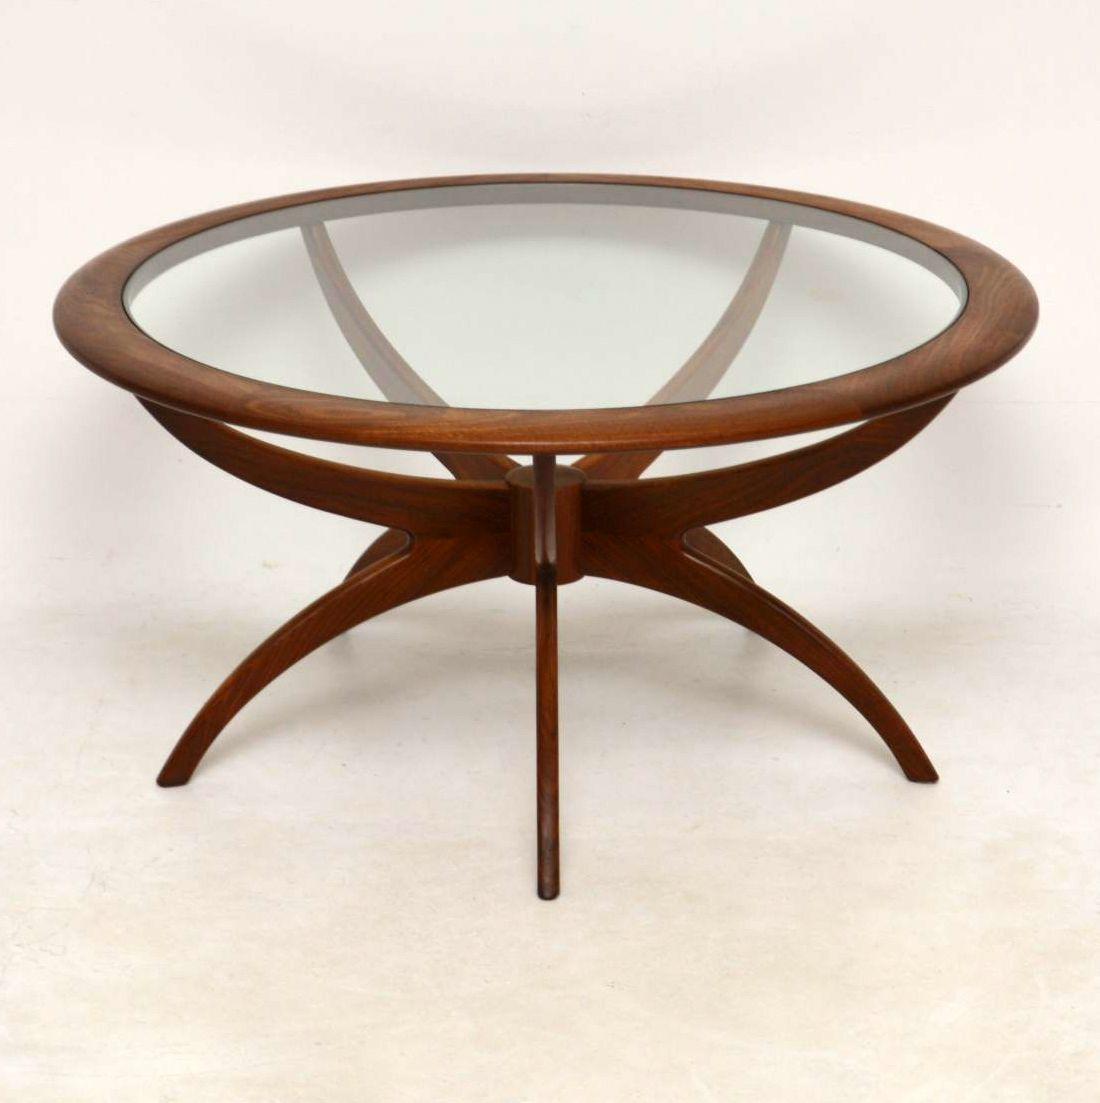 G Plan Vintage Coffee Tables: 1960's Vintage Teak Spider Coffee Table By G- Plan